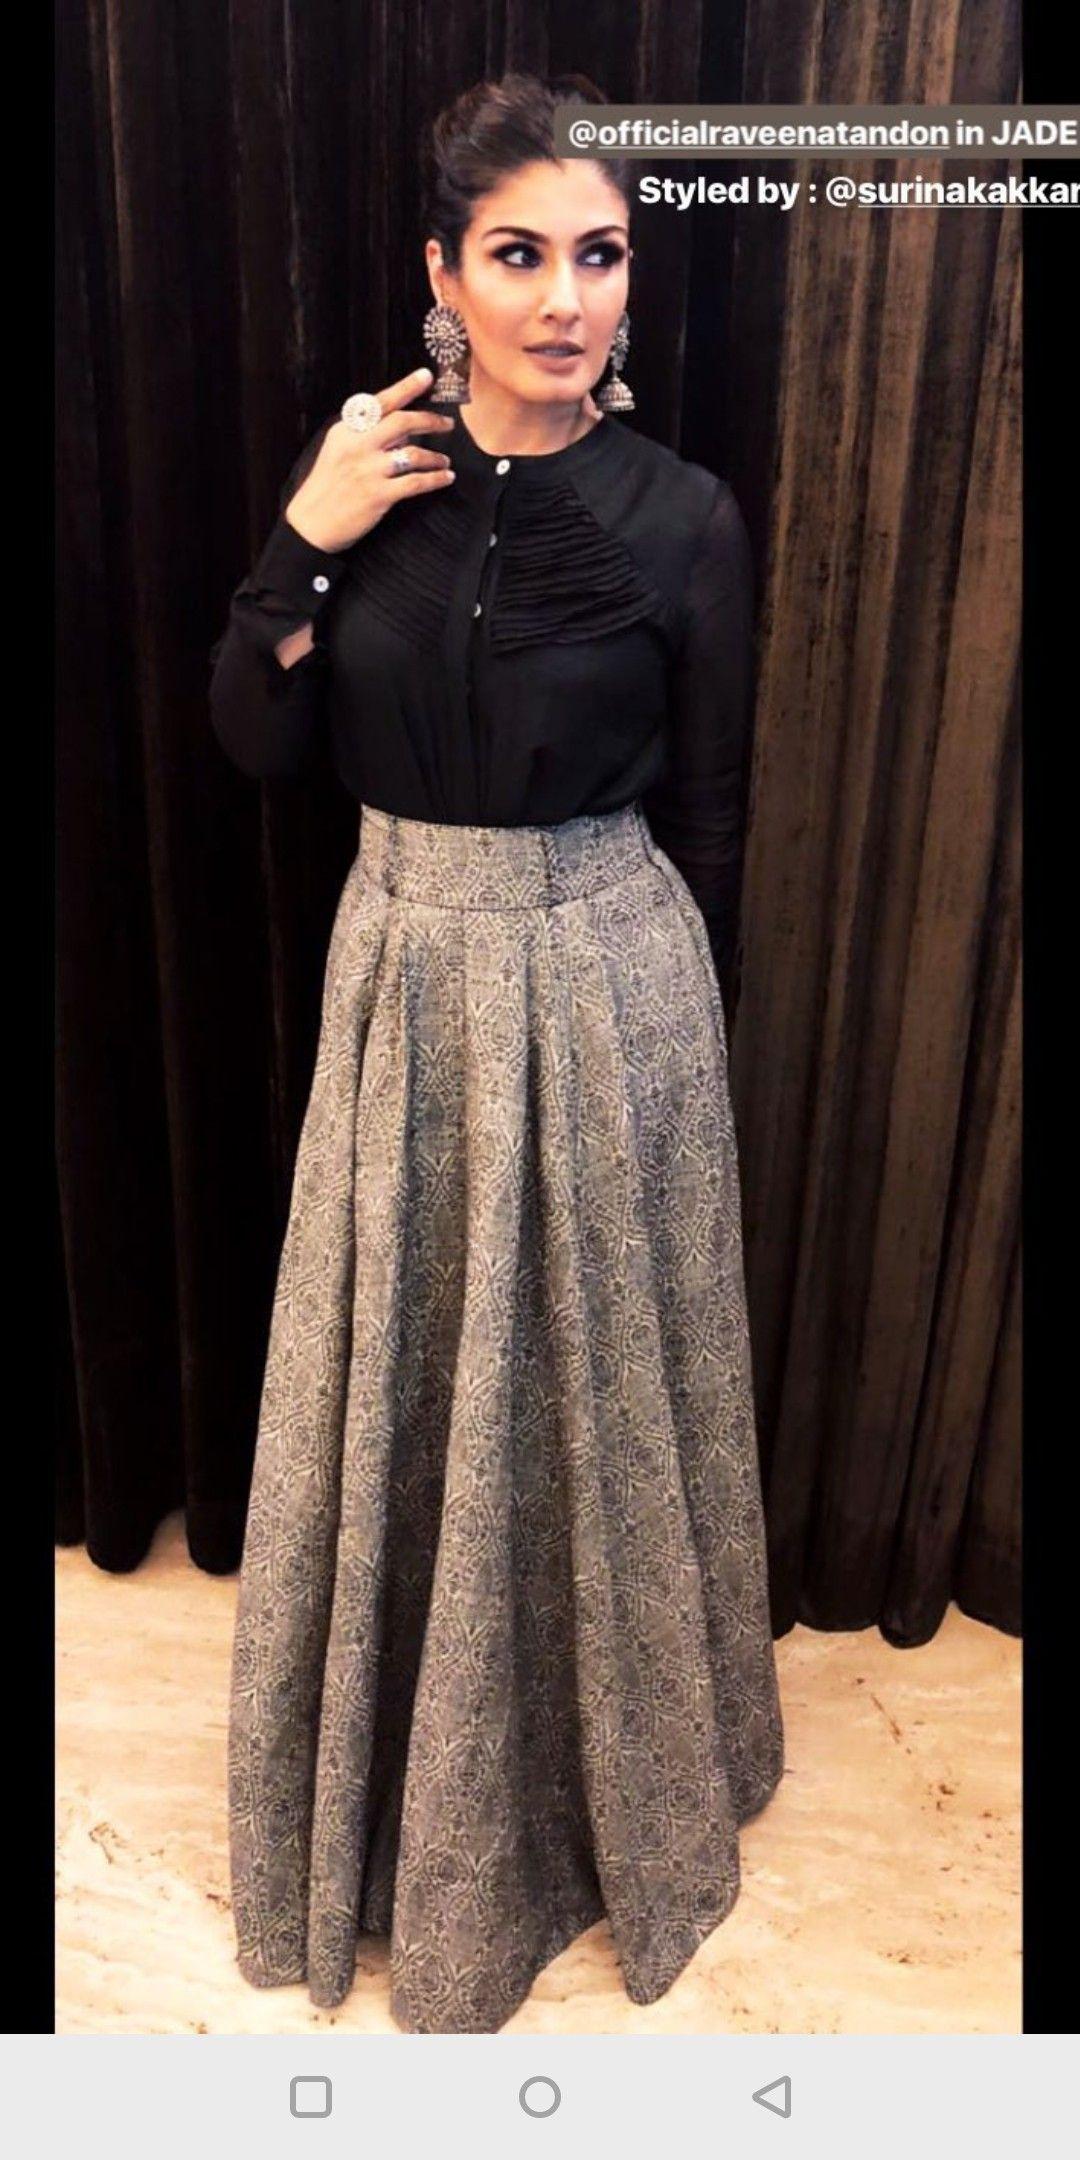 Pin by Jayaarora on Dresses  Pinterest  Indian designer wear